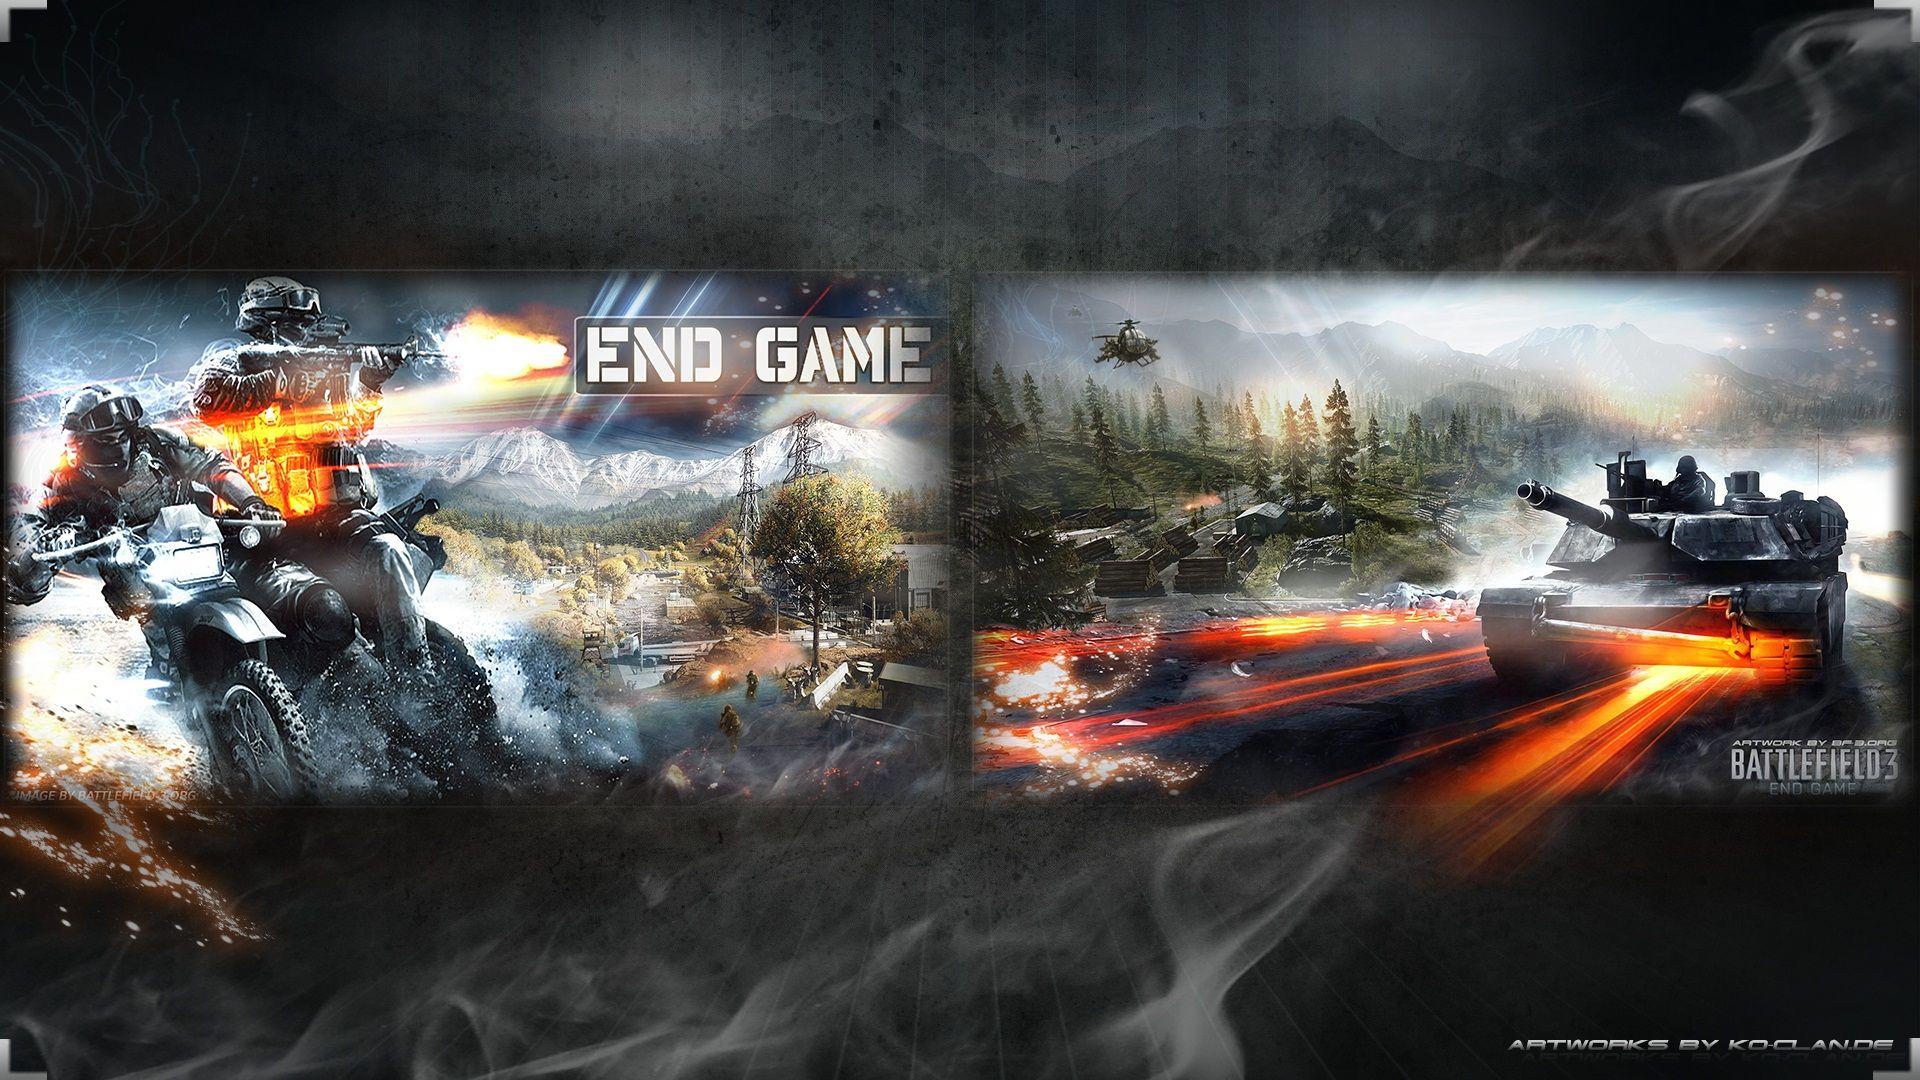 Battlefield 3 End Game by Ko-Clan